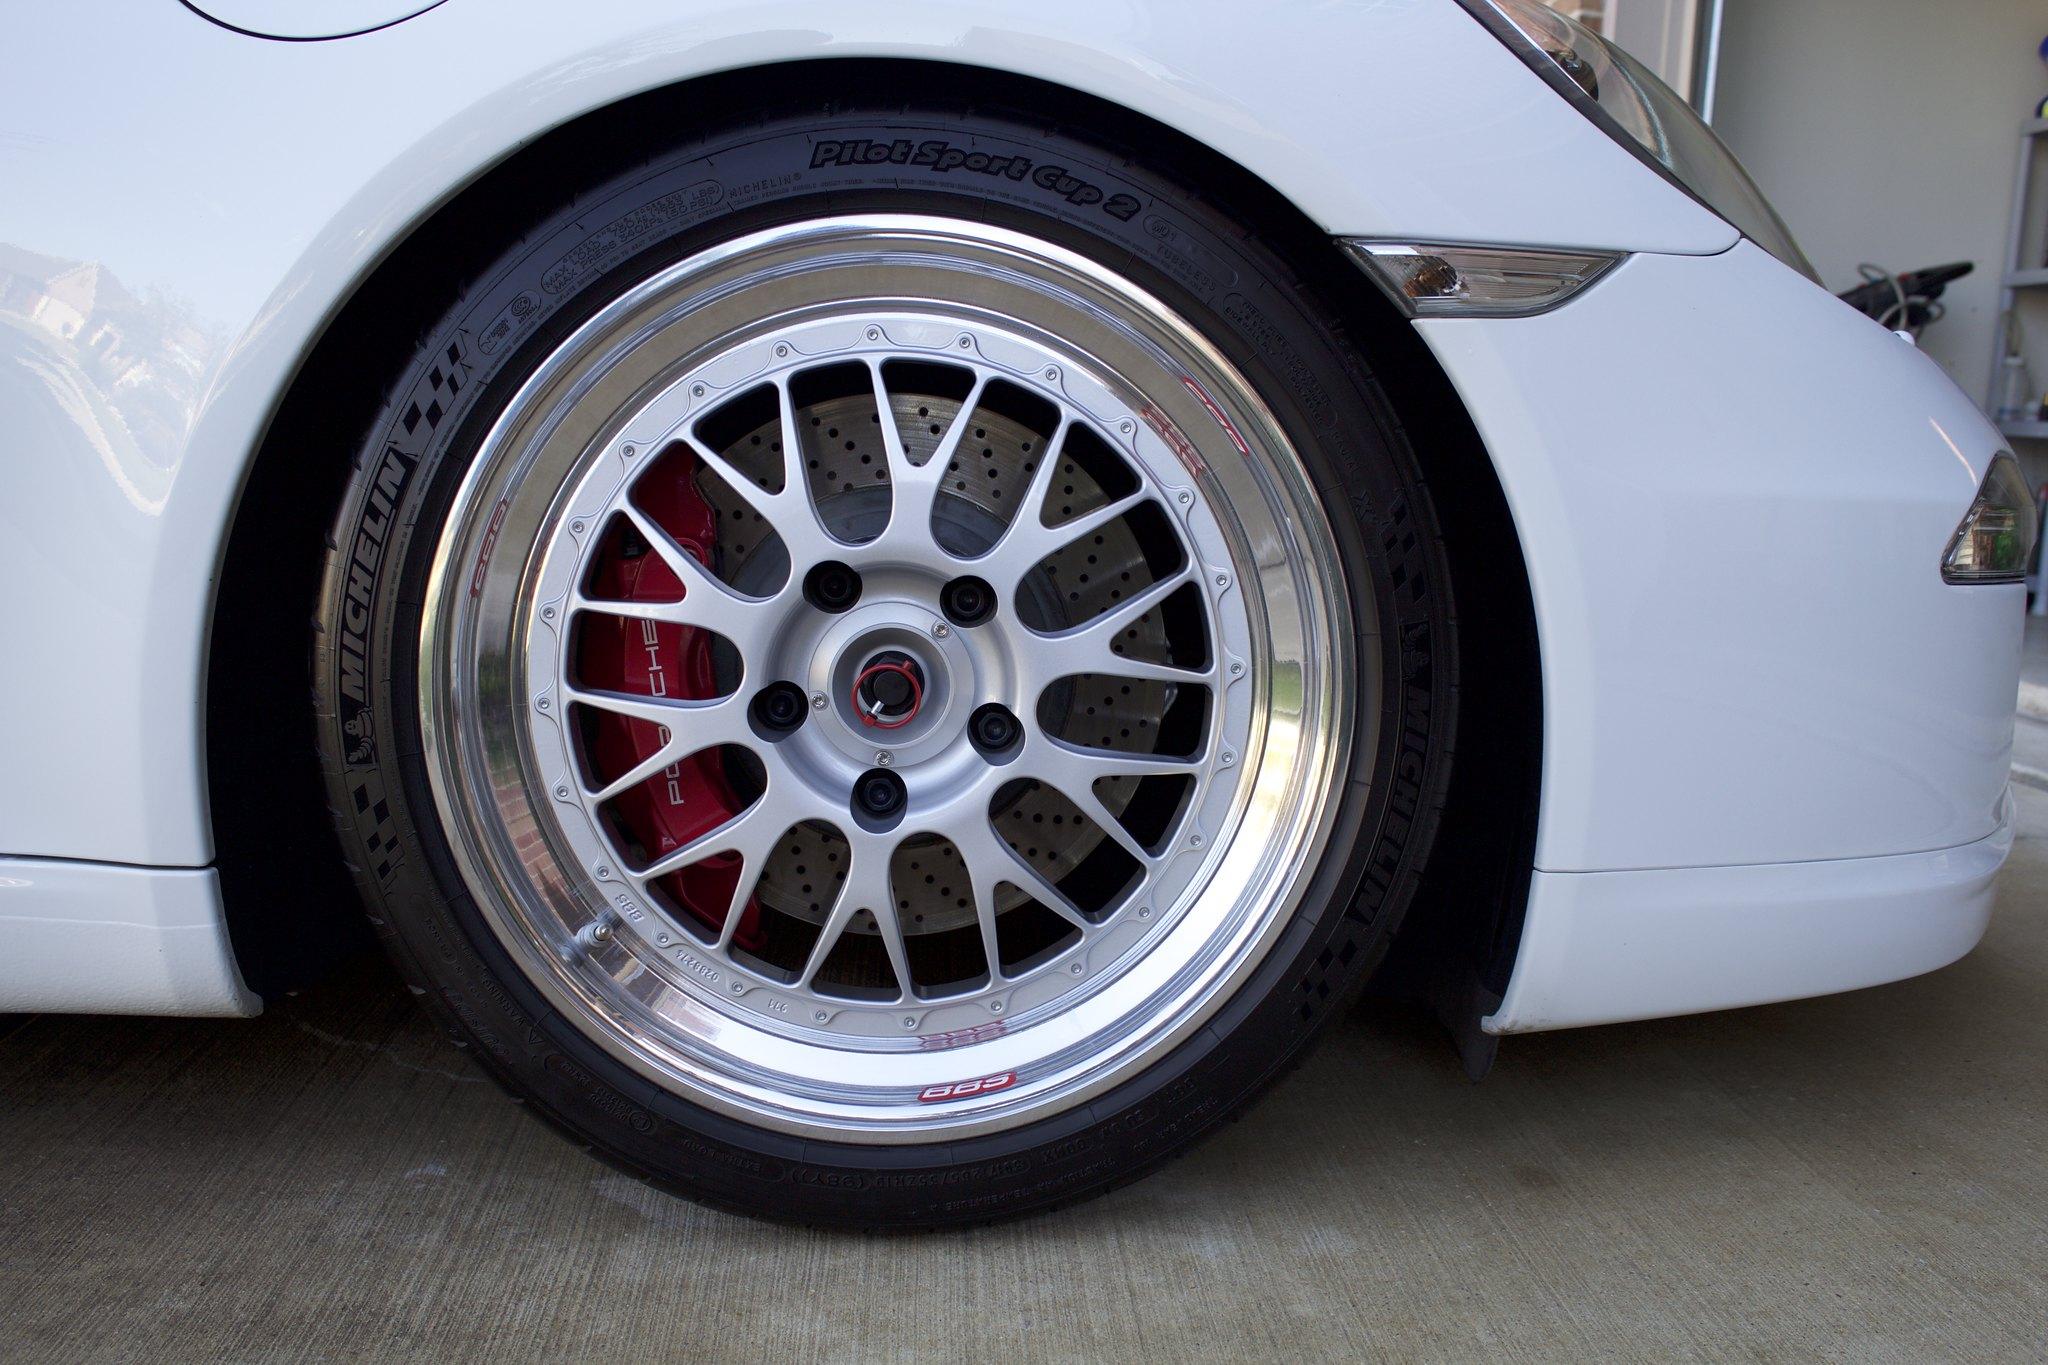 911r For Sale >> 2013 991.1S X51, Aero, PDCC, PDK, SPASM - 6SpeedOnline - Porsche Forum and Luxury Car Resource